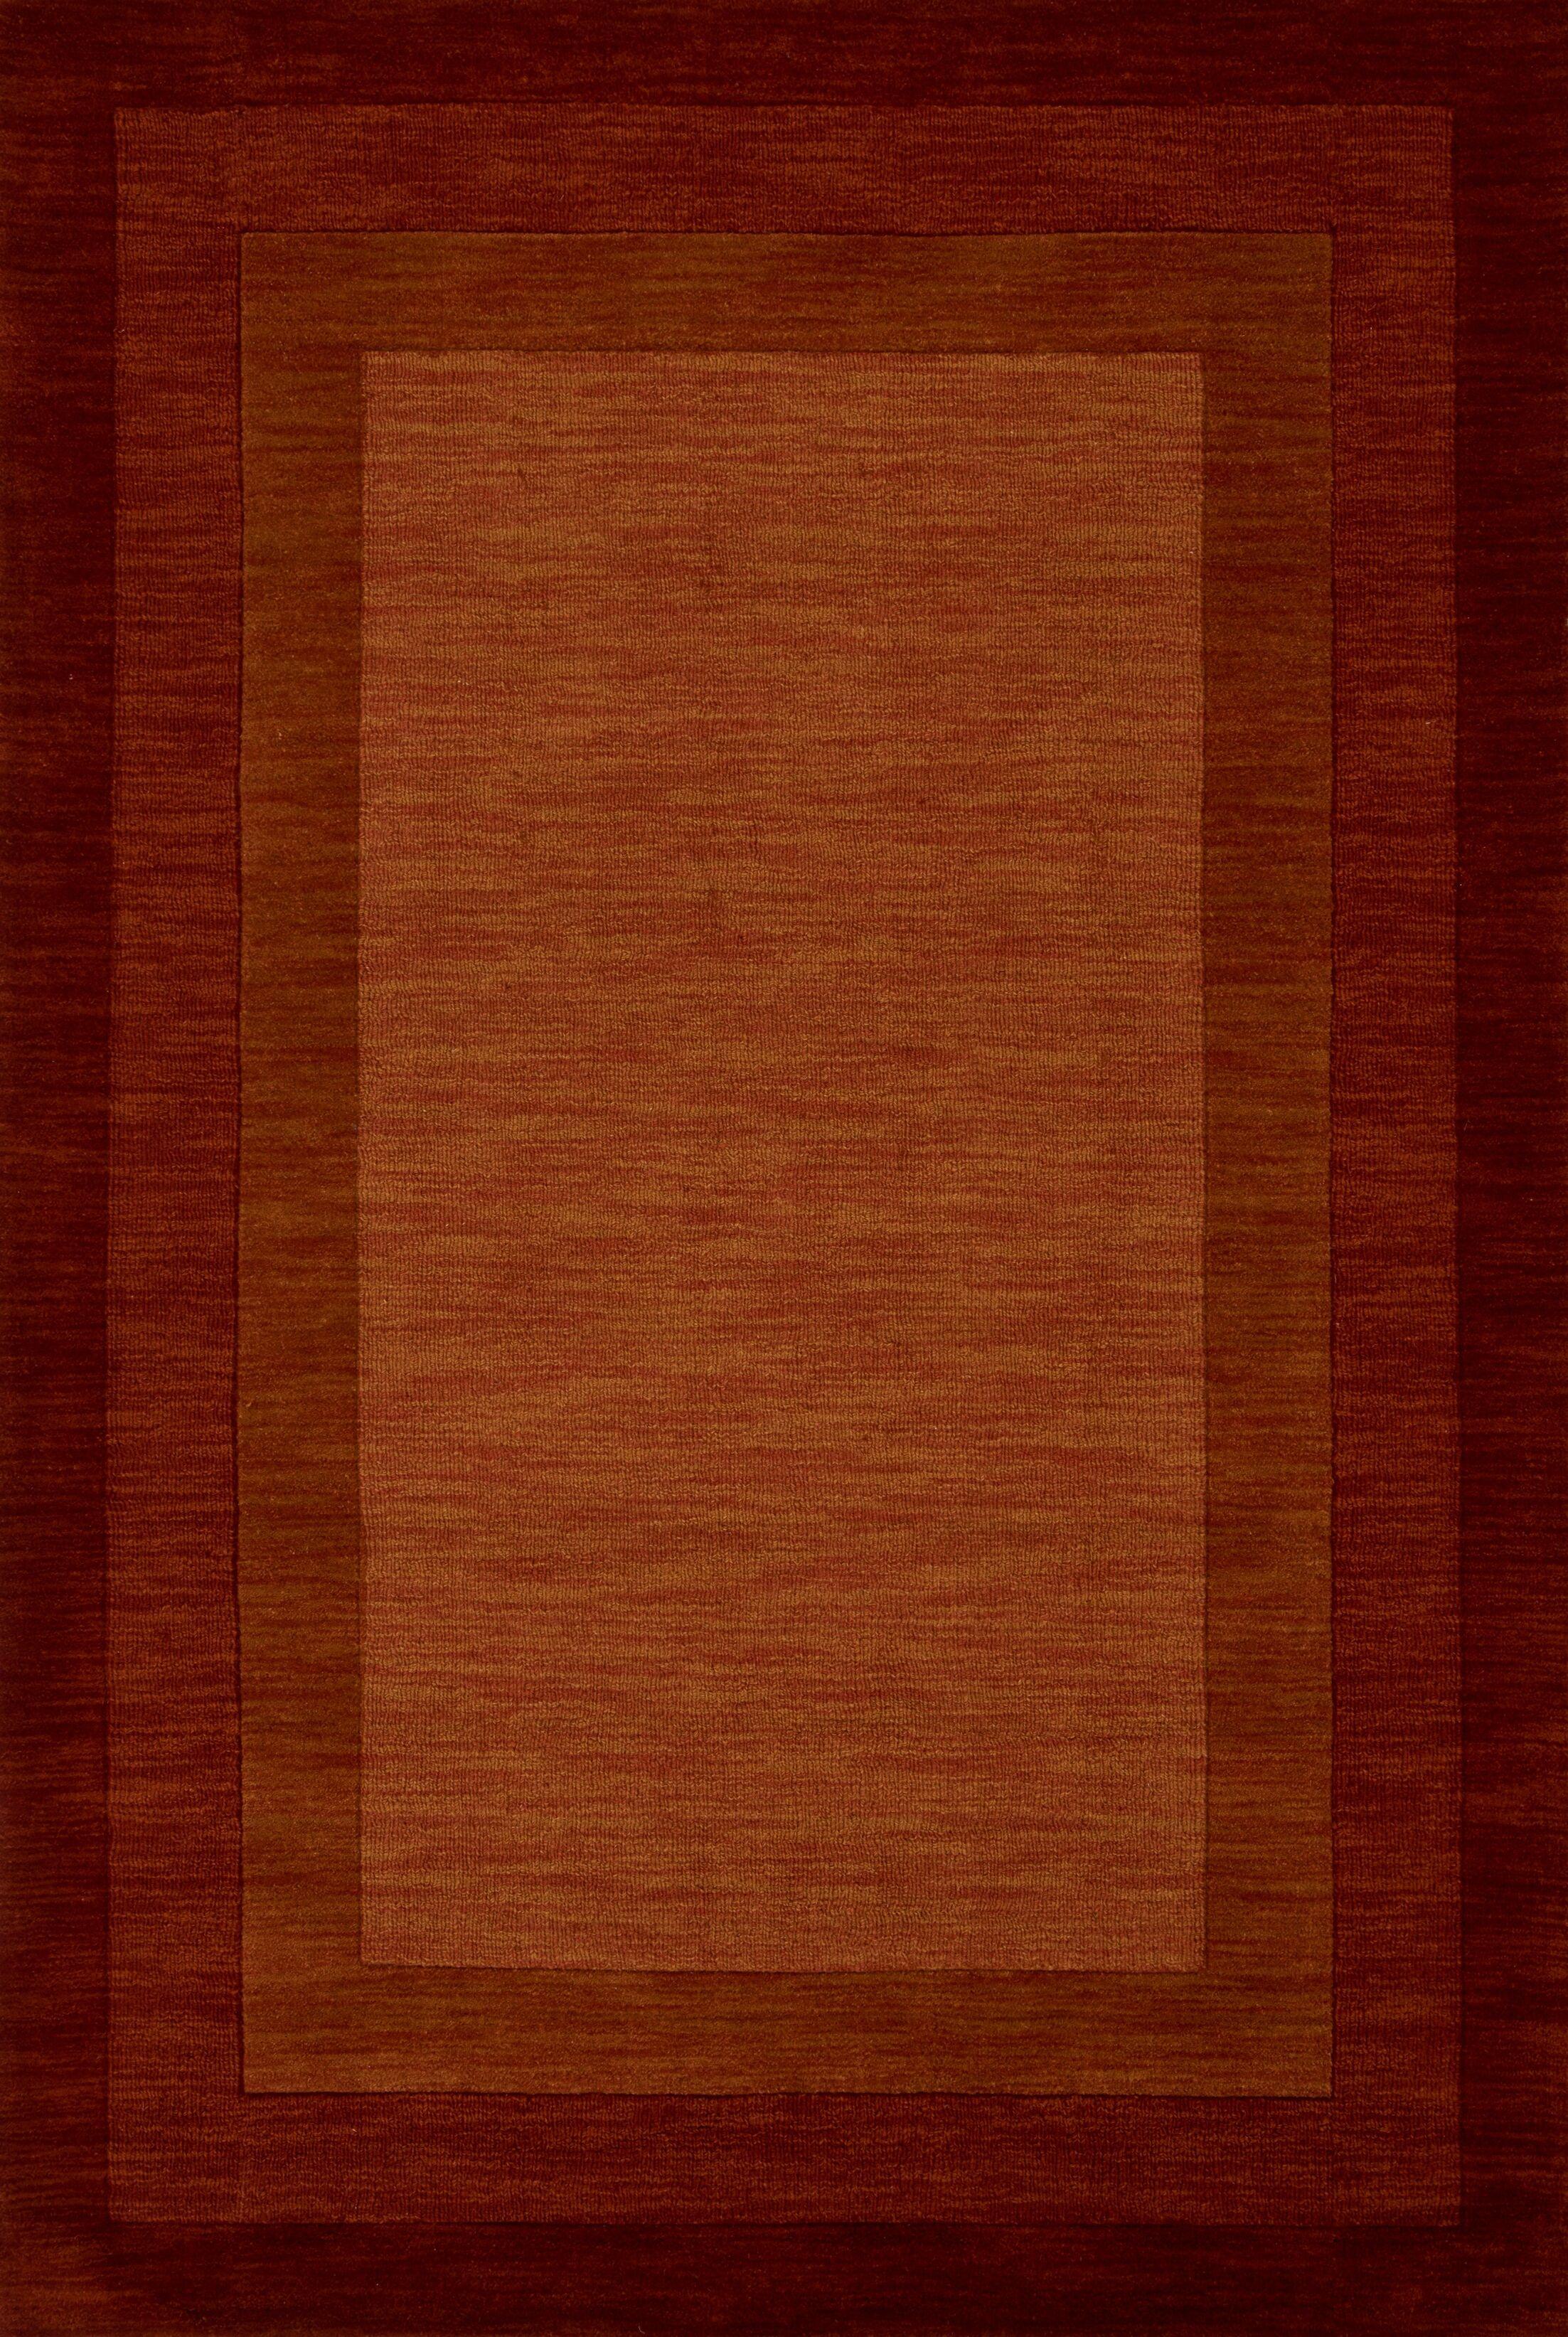 Keifer Hand-Tufted Red Area Rug Rug Size: Rectangle 3'6